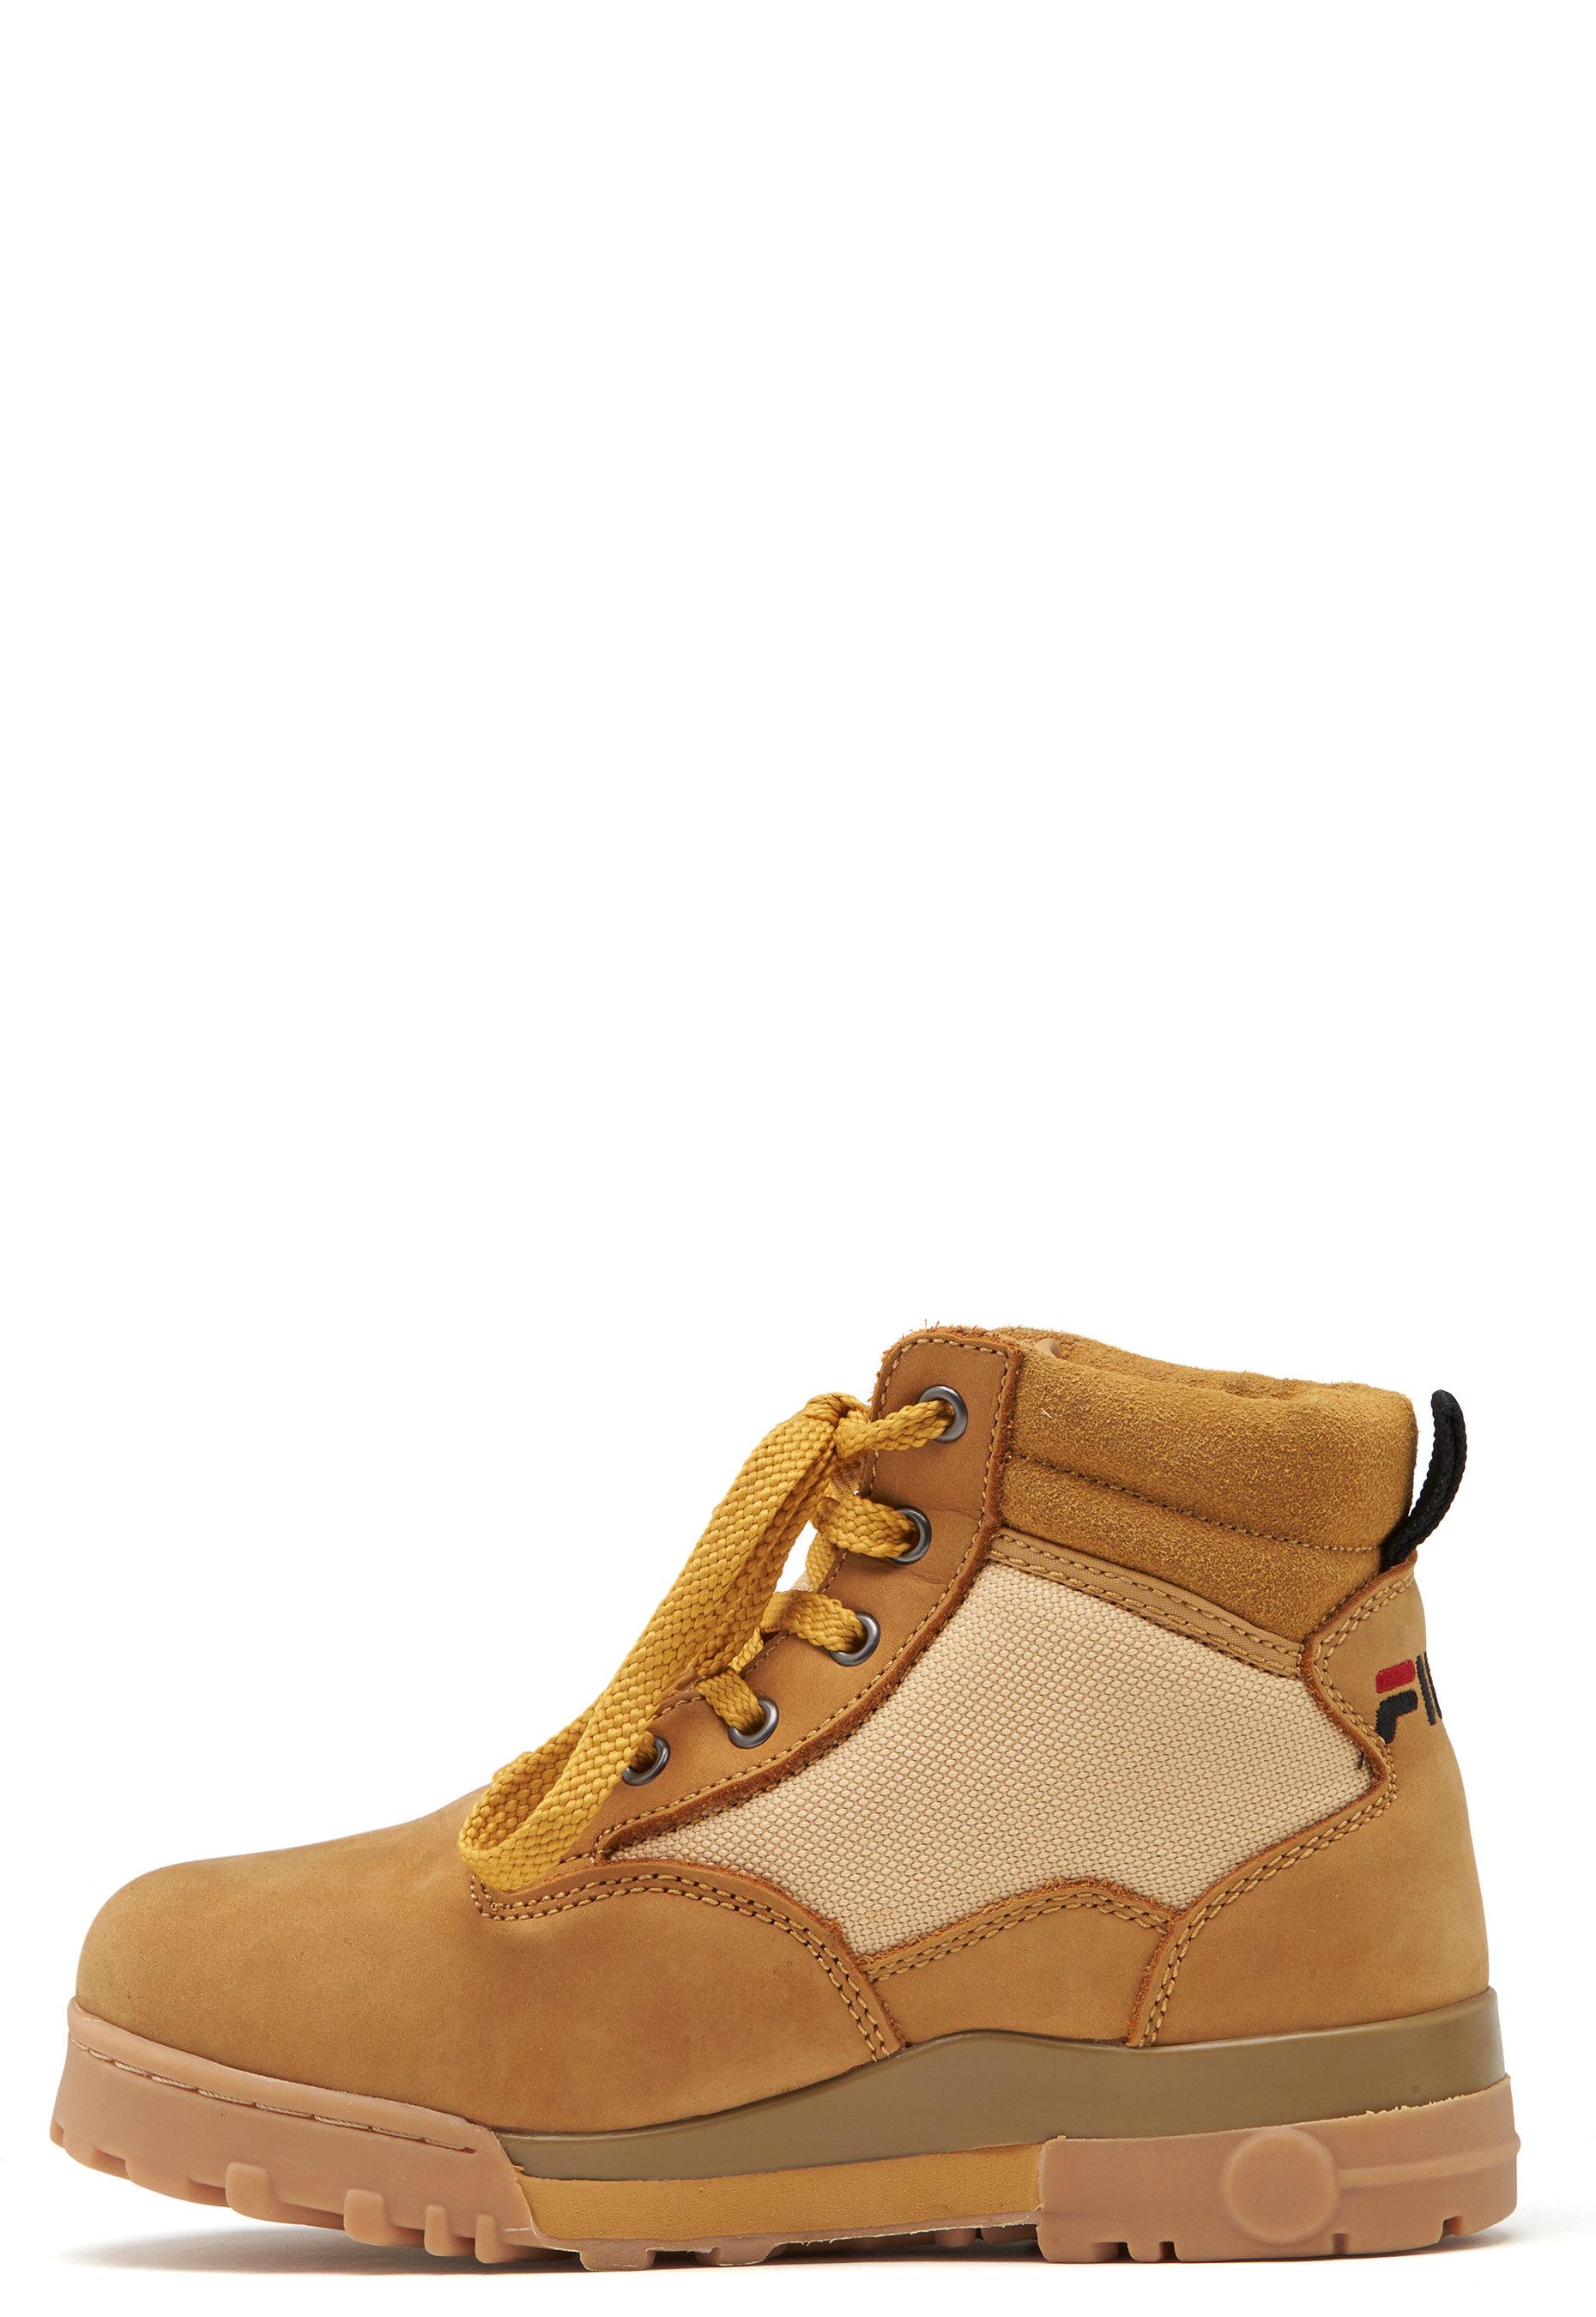 FILA Grunge Mid Wmn Boots Chipmunk - Bubbleroom